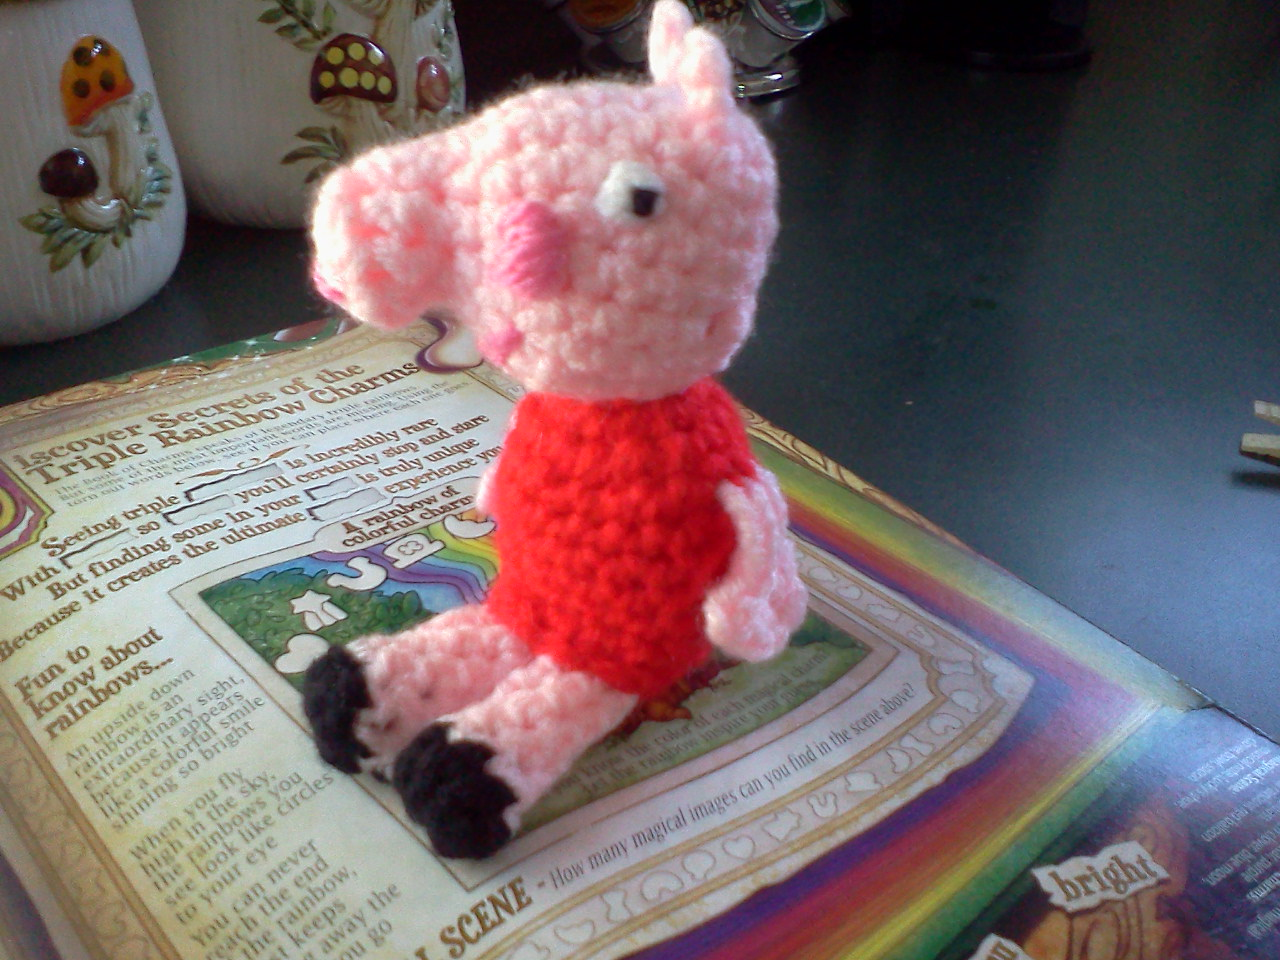 Amigurumi Deer Pattern : Serendipity Creative: Peppa Pig Amigurumi Crochet Doll ...